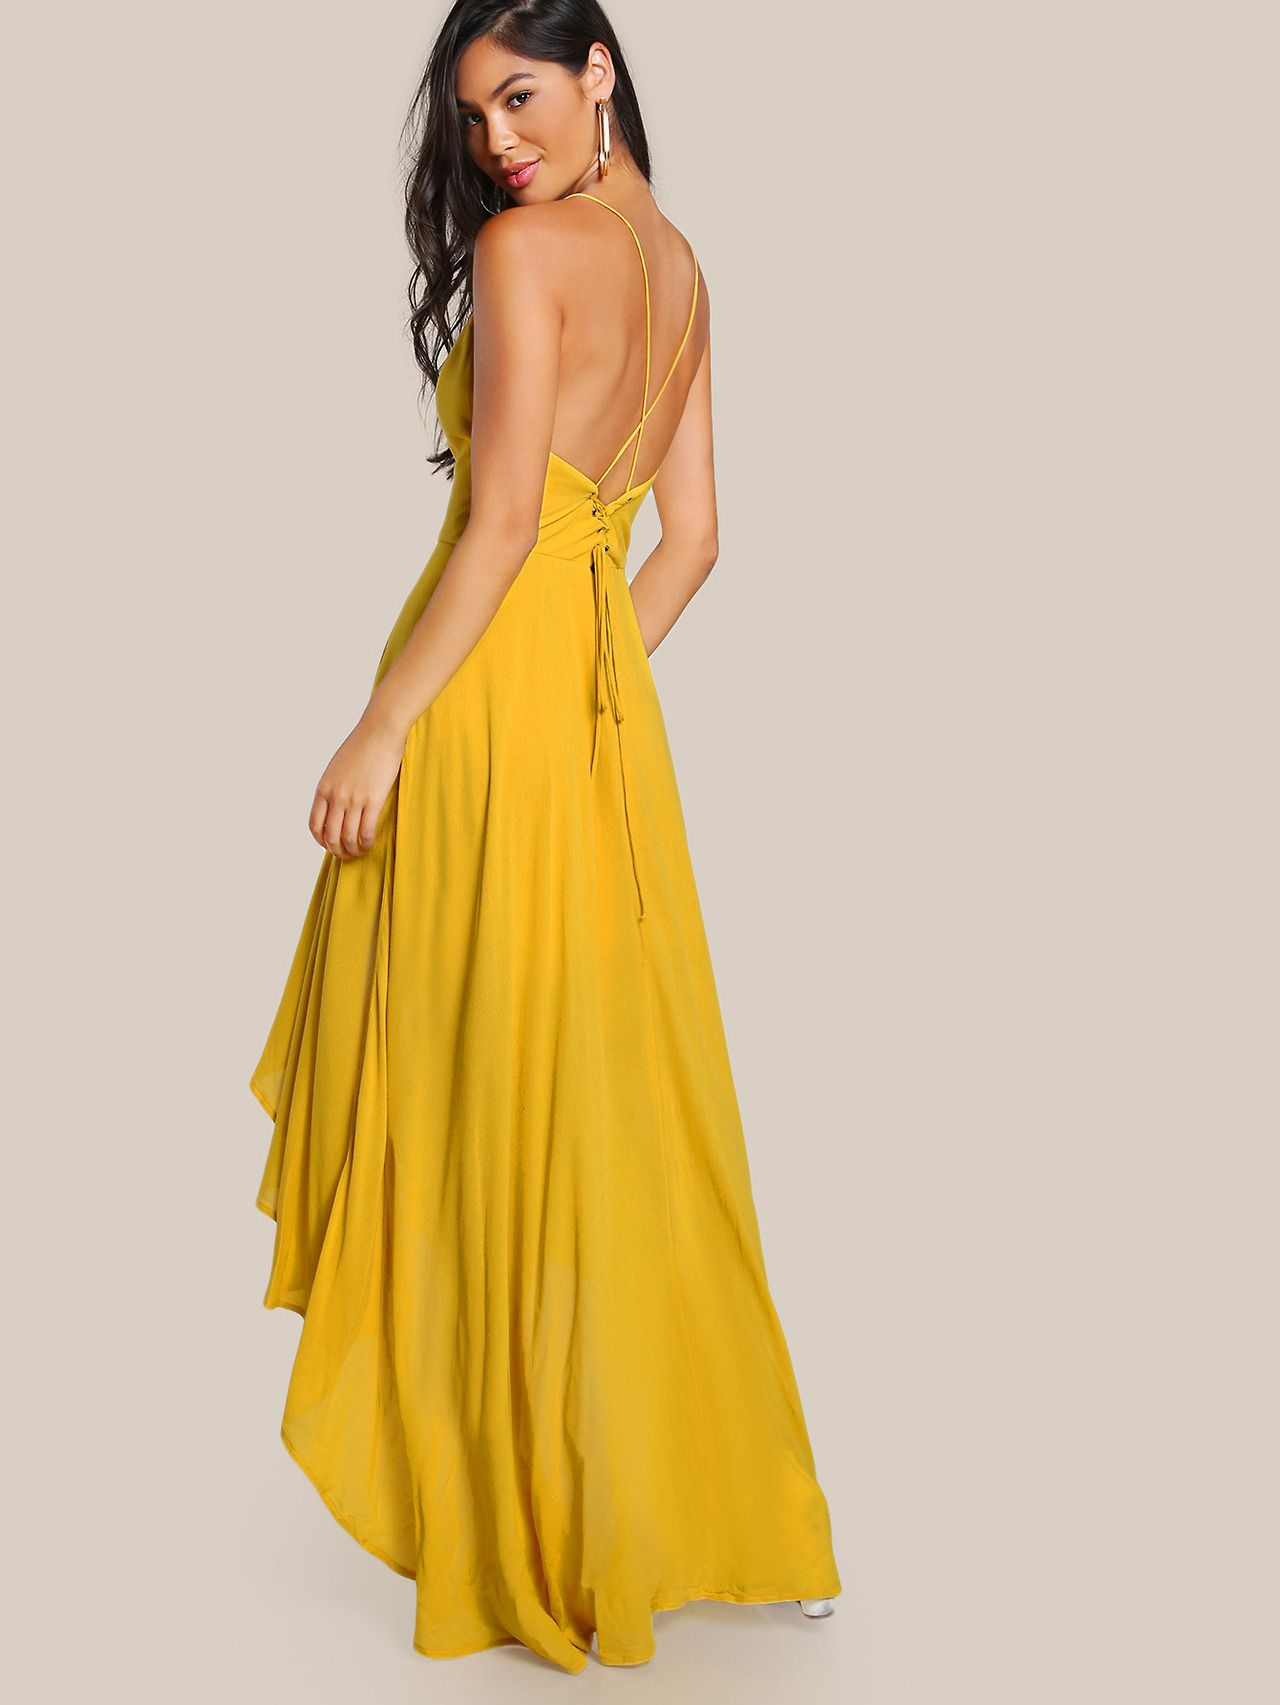 Sheinside Backless High Low Cami Dress Cami Maxi Dress